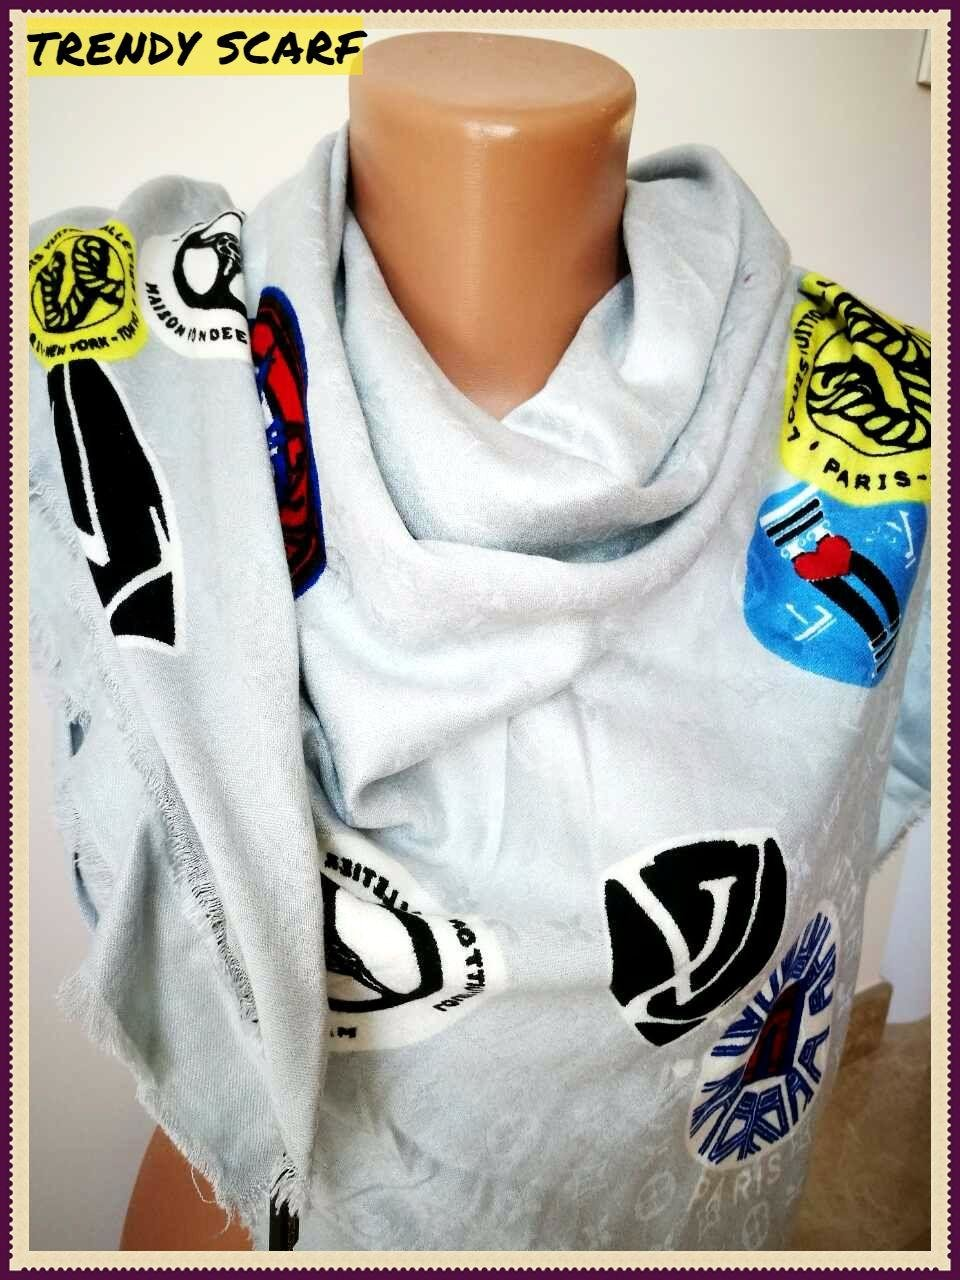 777a8c79a2c9 Платки в стиле Луи Виттон. Купить платок в стиле луи виттон Официальный сайт  📌 http